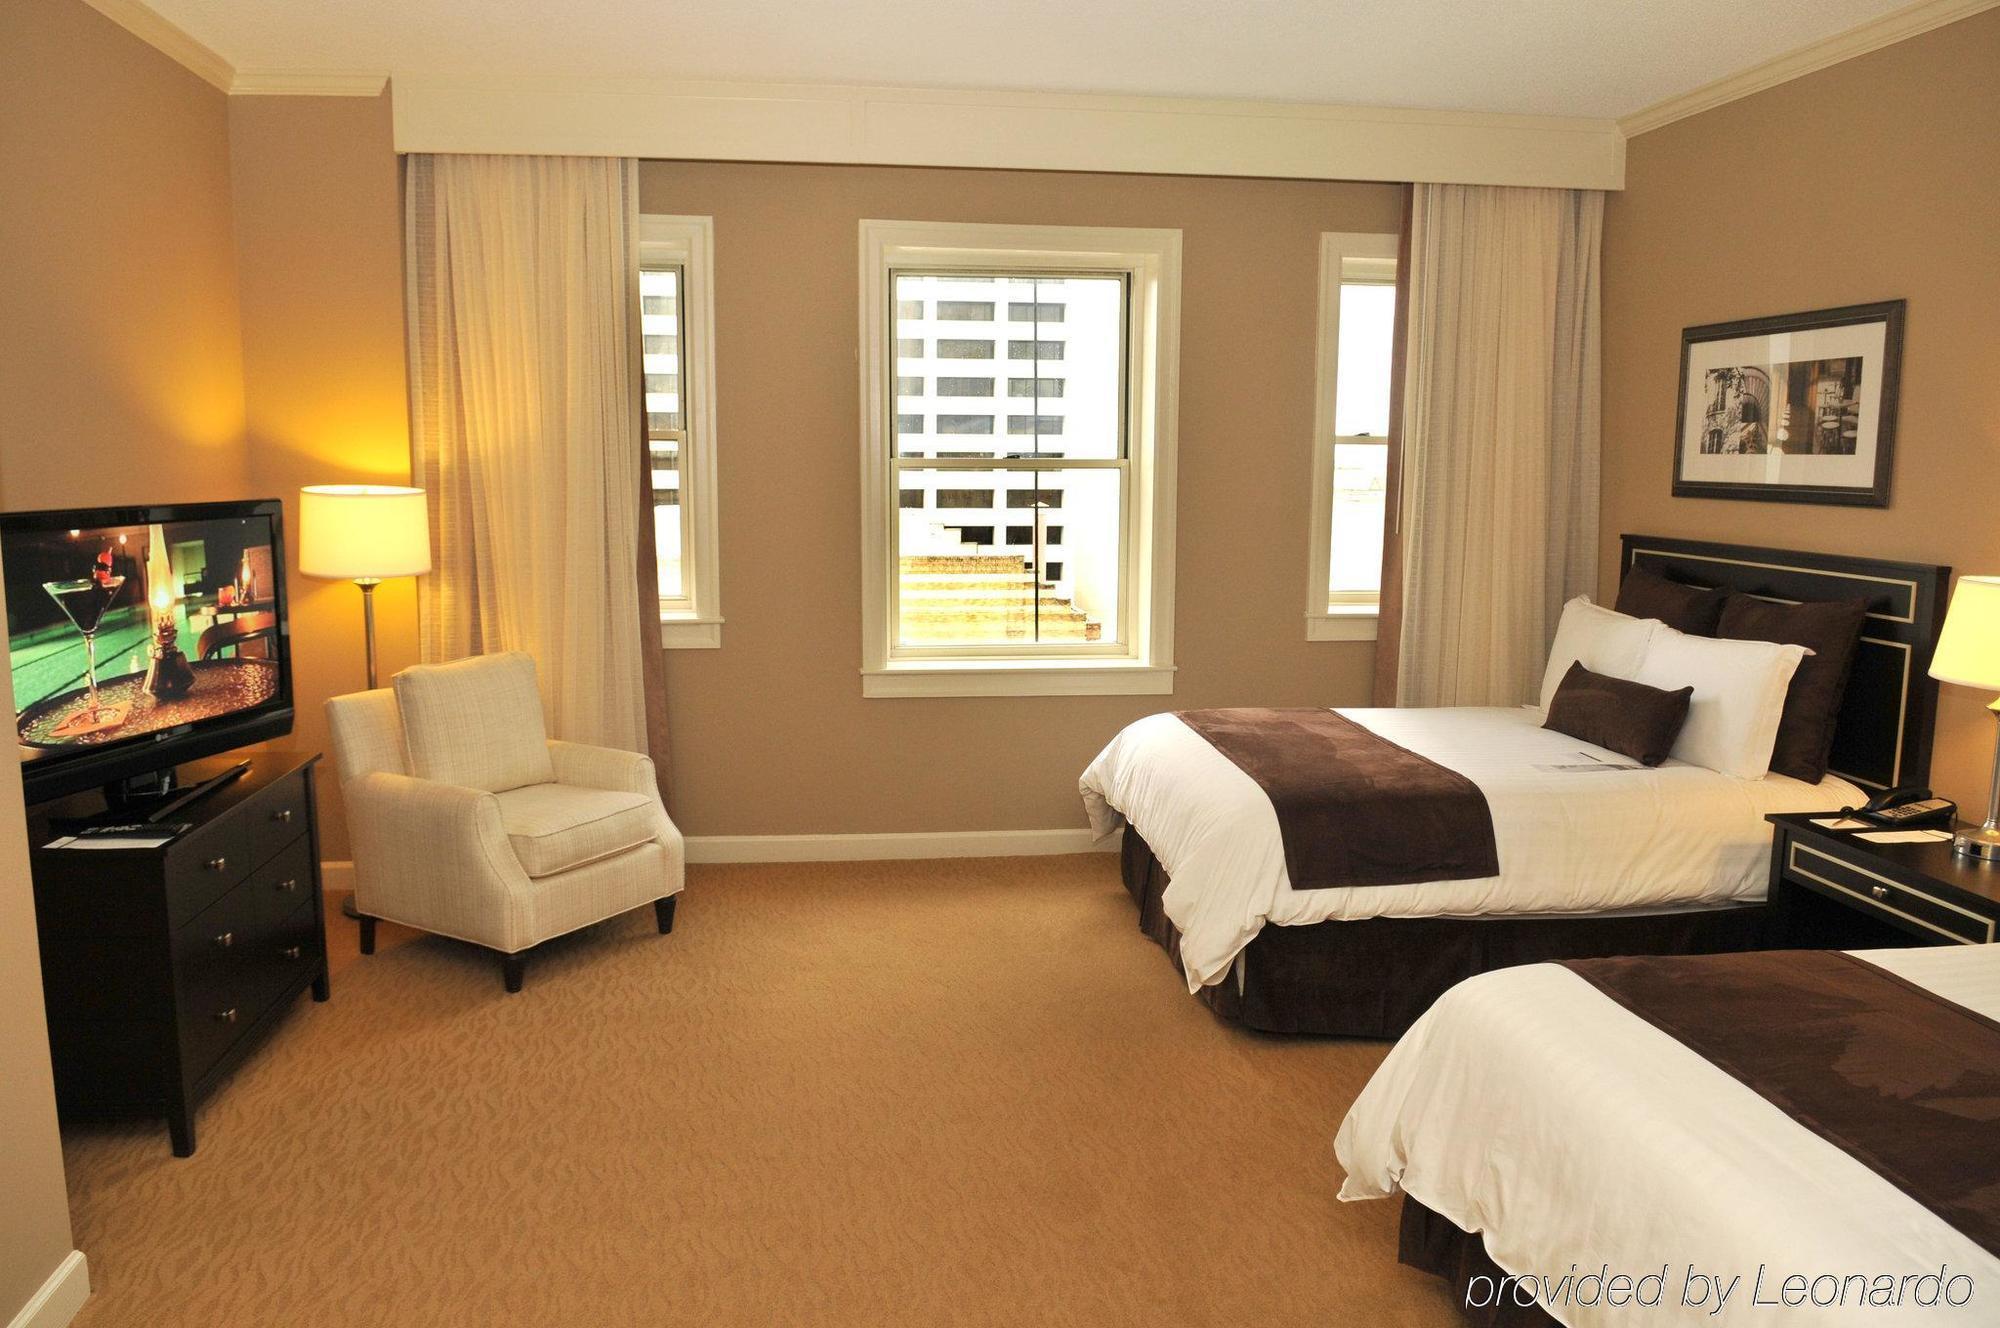 2 bedroom suites in atlanta ga residence inn atlanta buckhead   georgian  terrace hotel  atlanta. 2 Bedroom Suites In Atlanta Ga good ideas   A1houston com